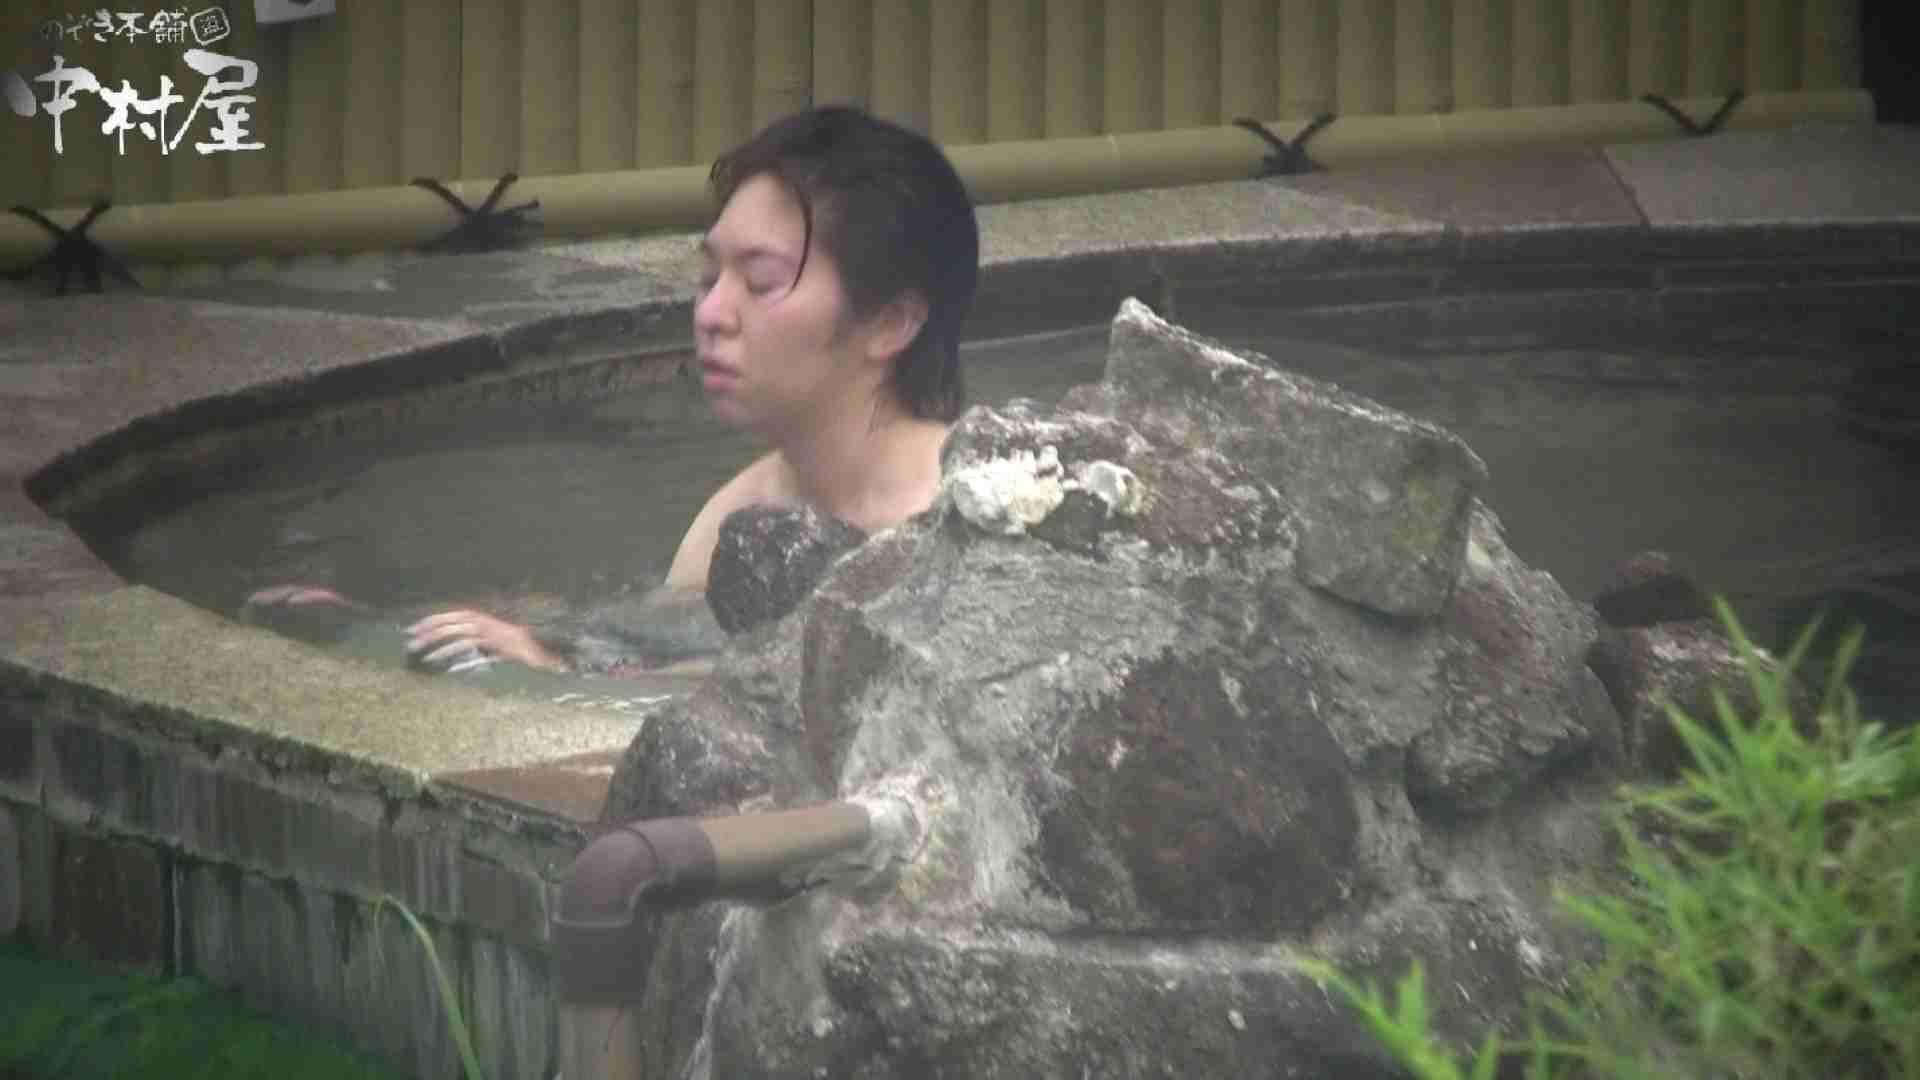 Aquaな露天風呂Vol.907 OL女体  95連発 3